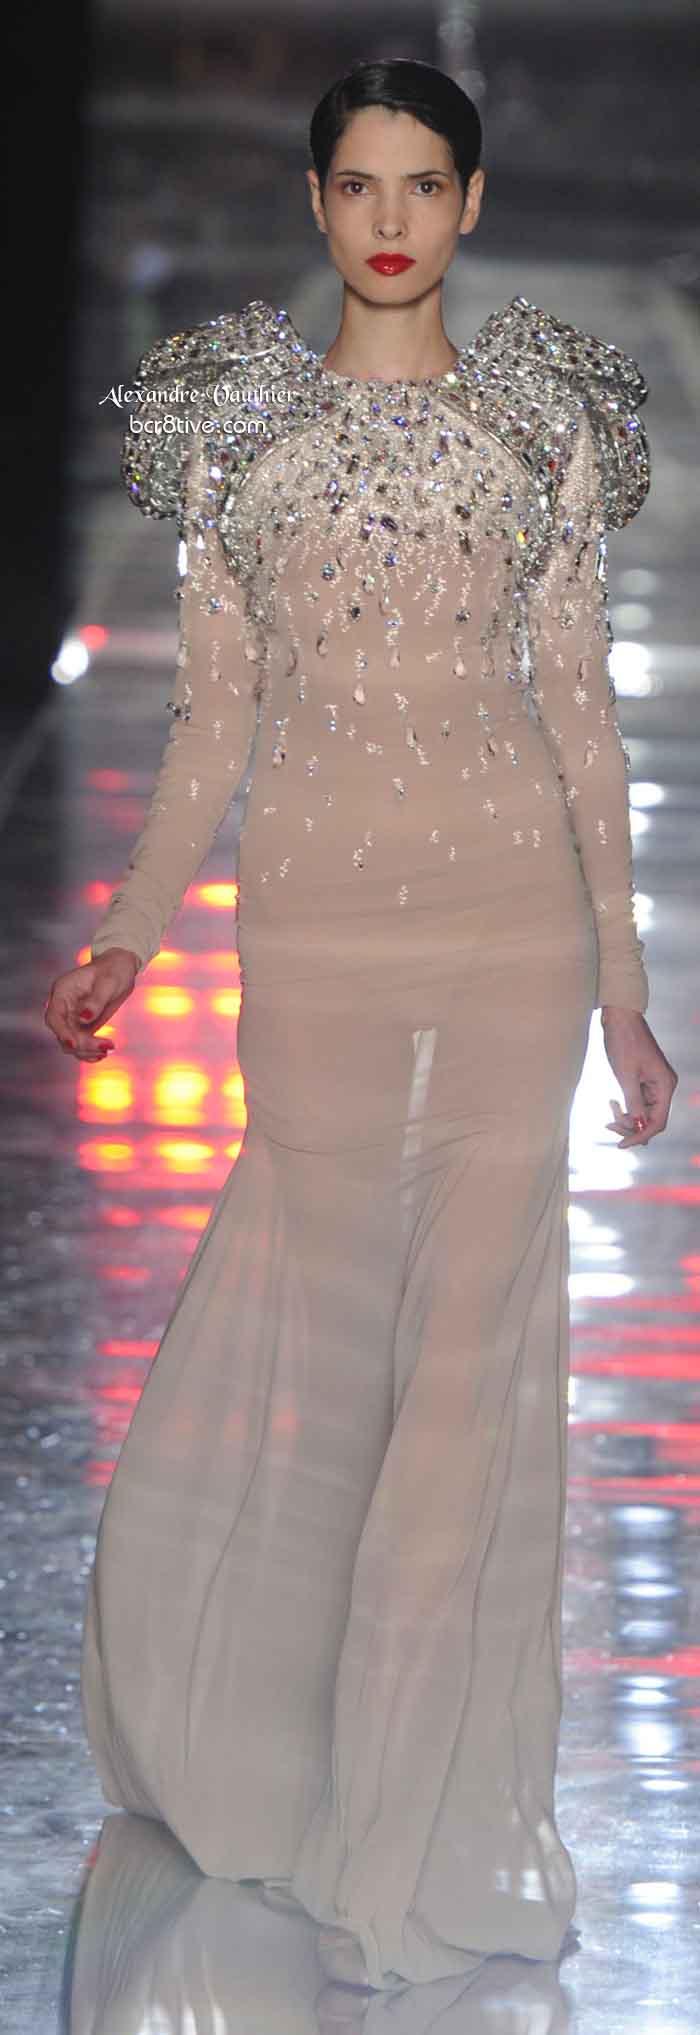 Alexandre Vauthier 2011-12 FW Haute Couture